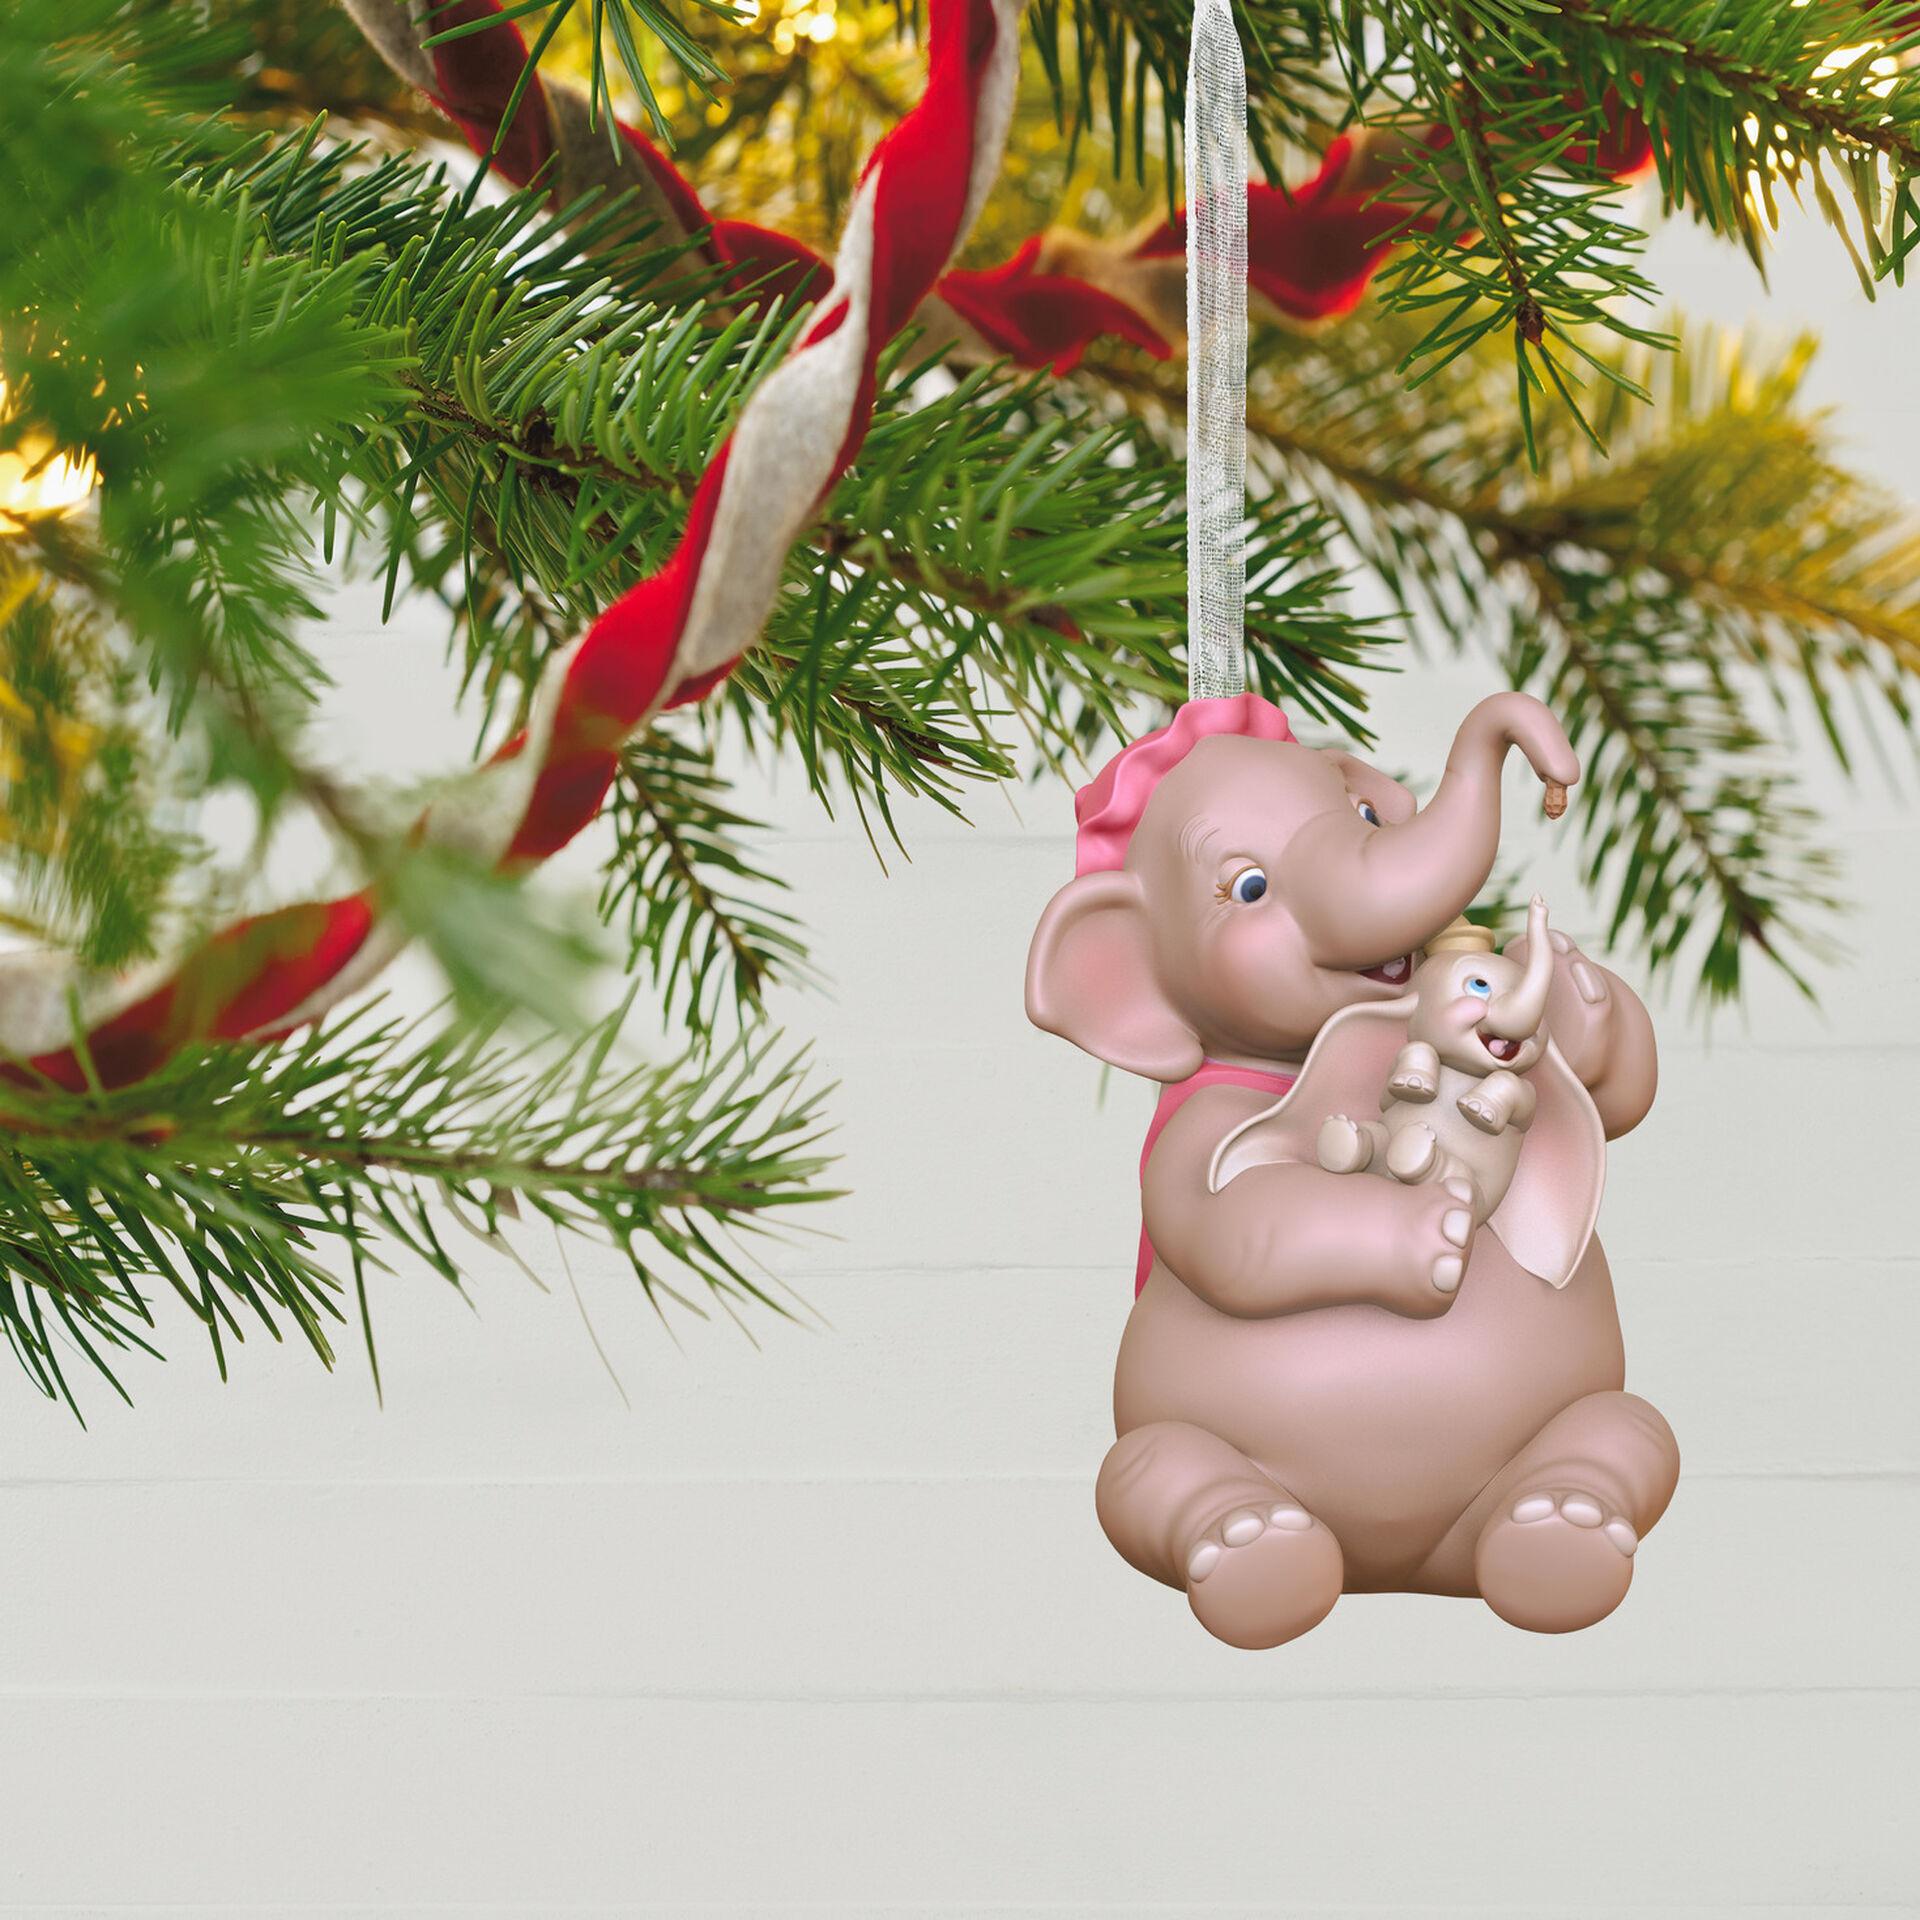 Disney Dumbo Christmas Tree Decoration New